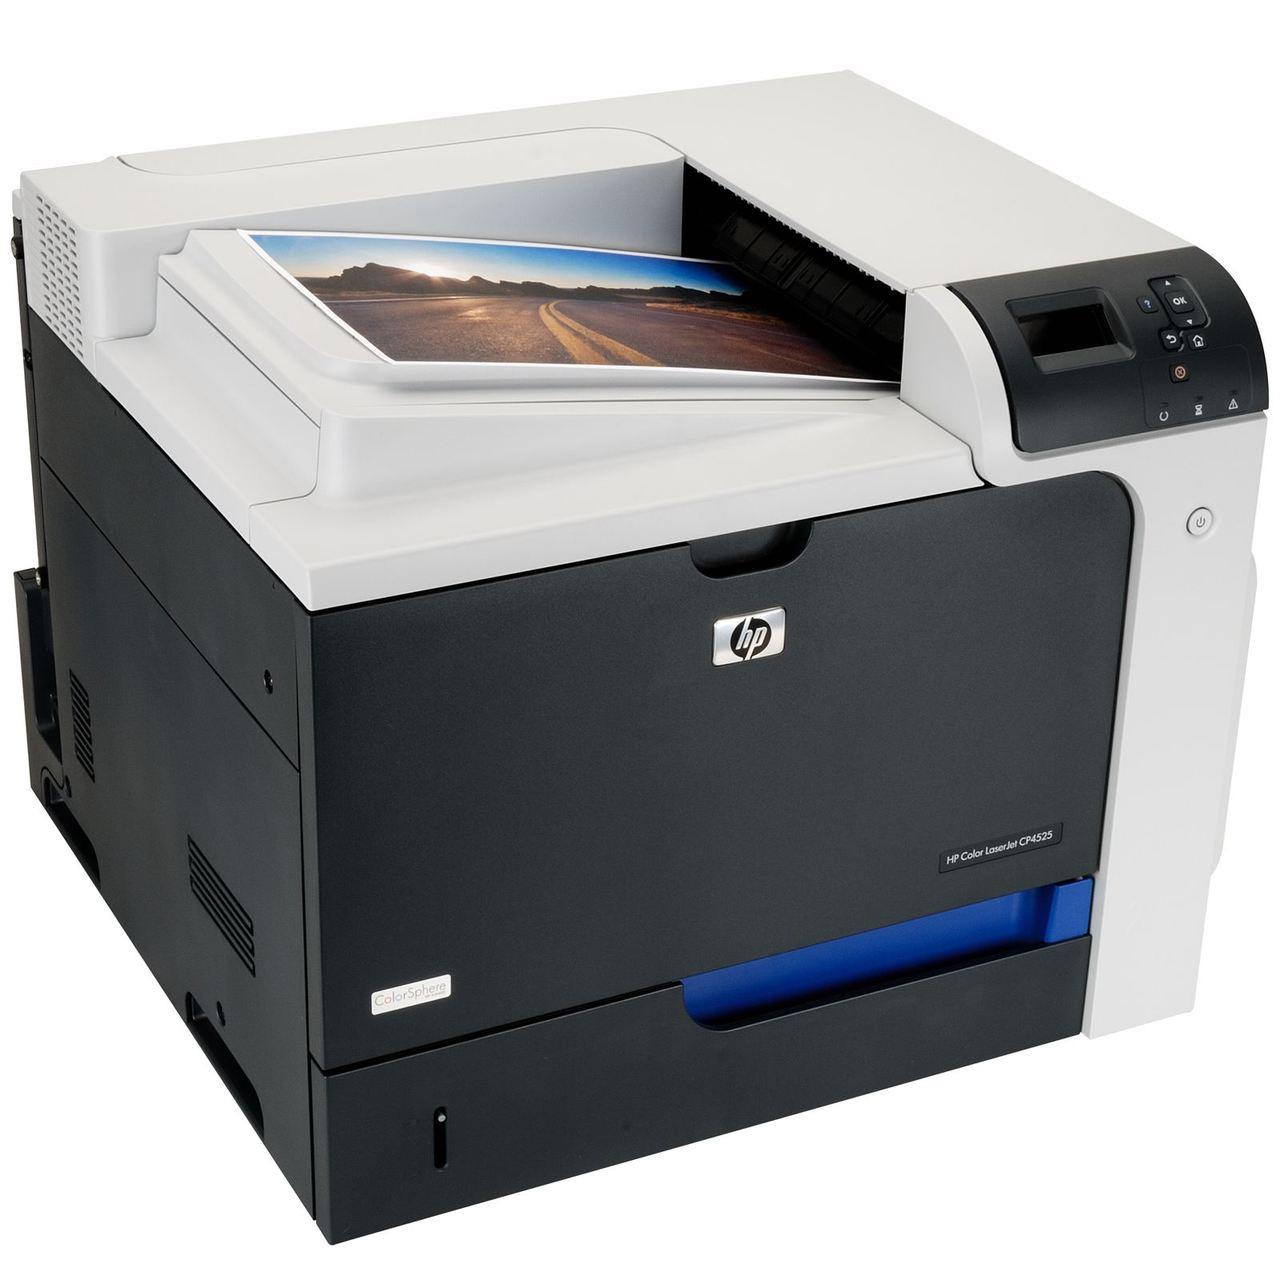 HP Color LaserJet CP4525N - CC493A - HP Laser Printer for sale